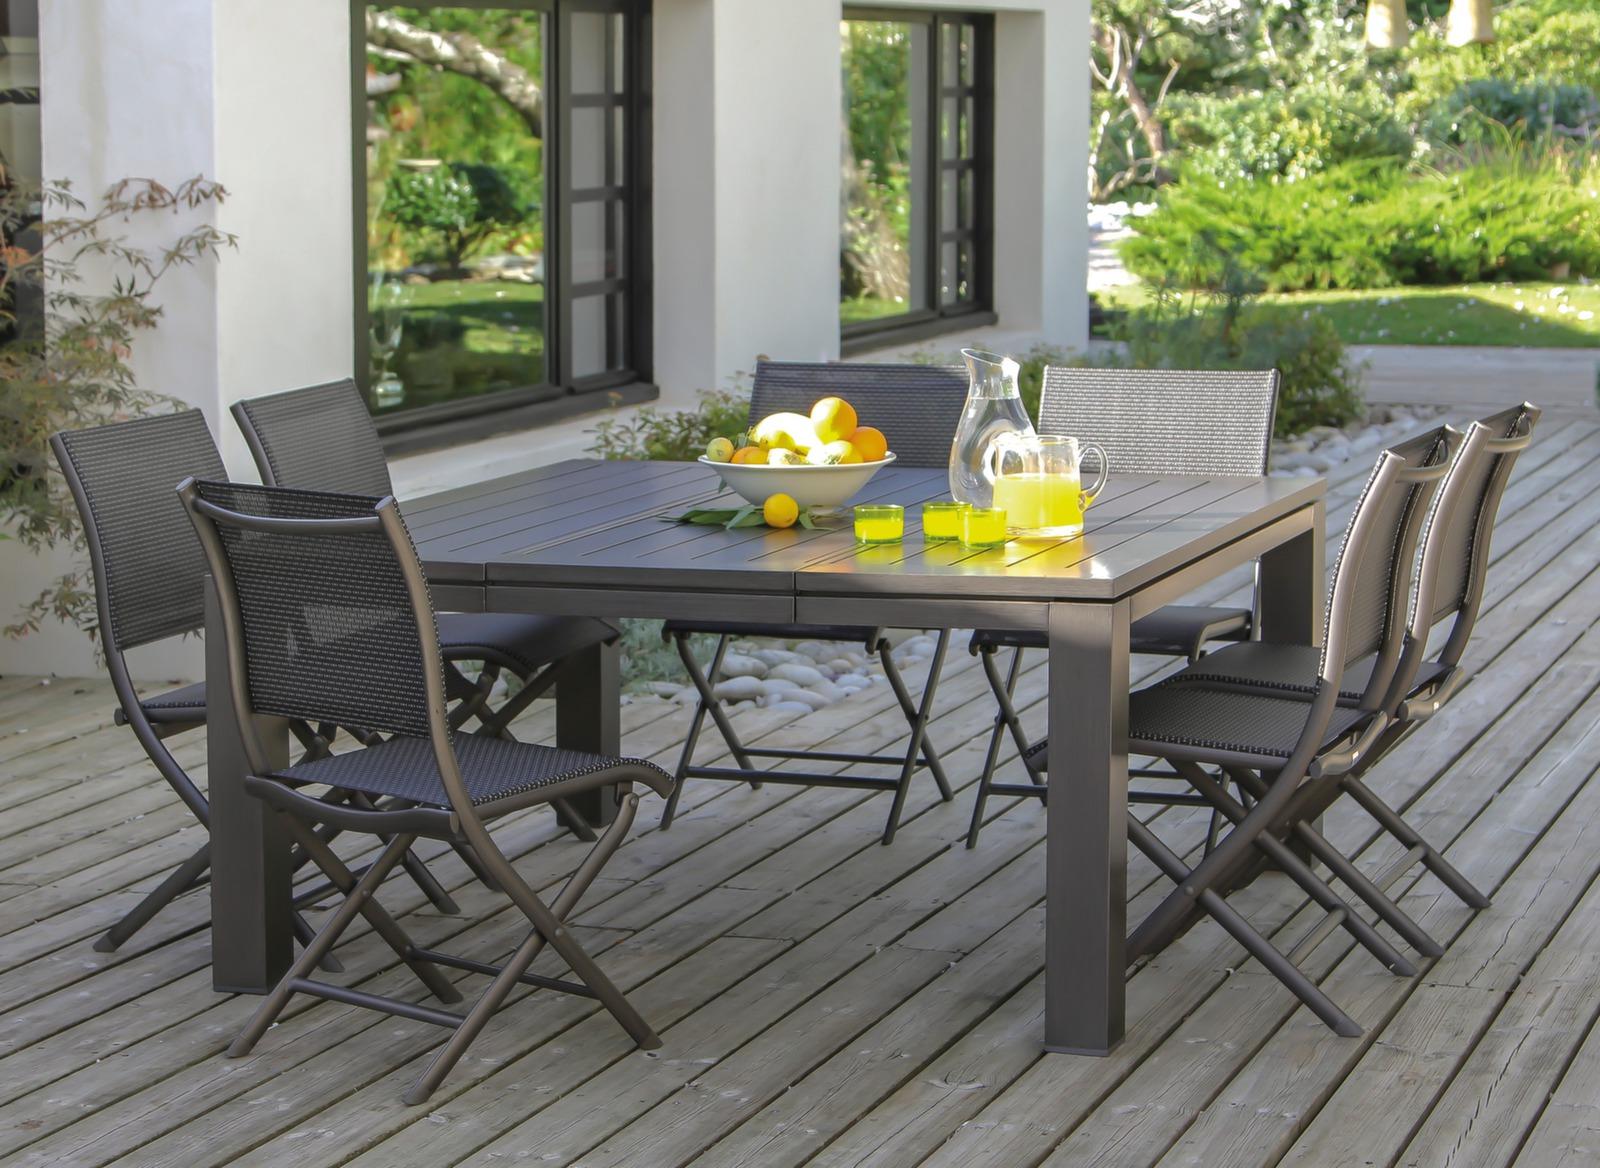 Table extensible latino 100 153 cm mobilier de jardin for Mobilier de jardin table